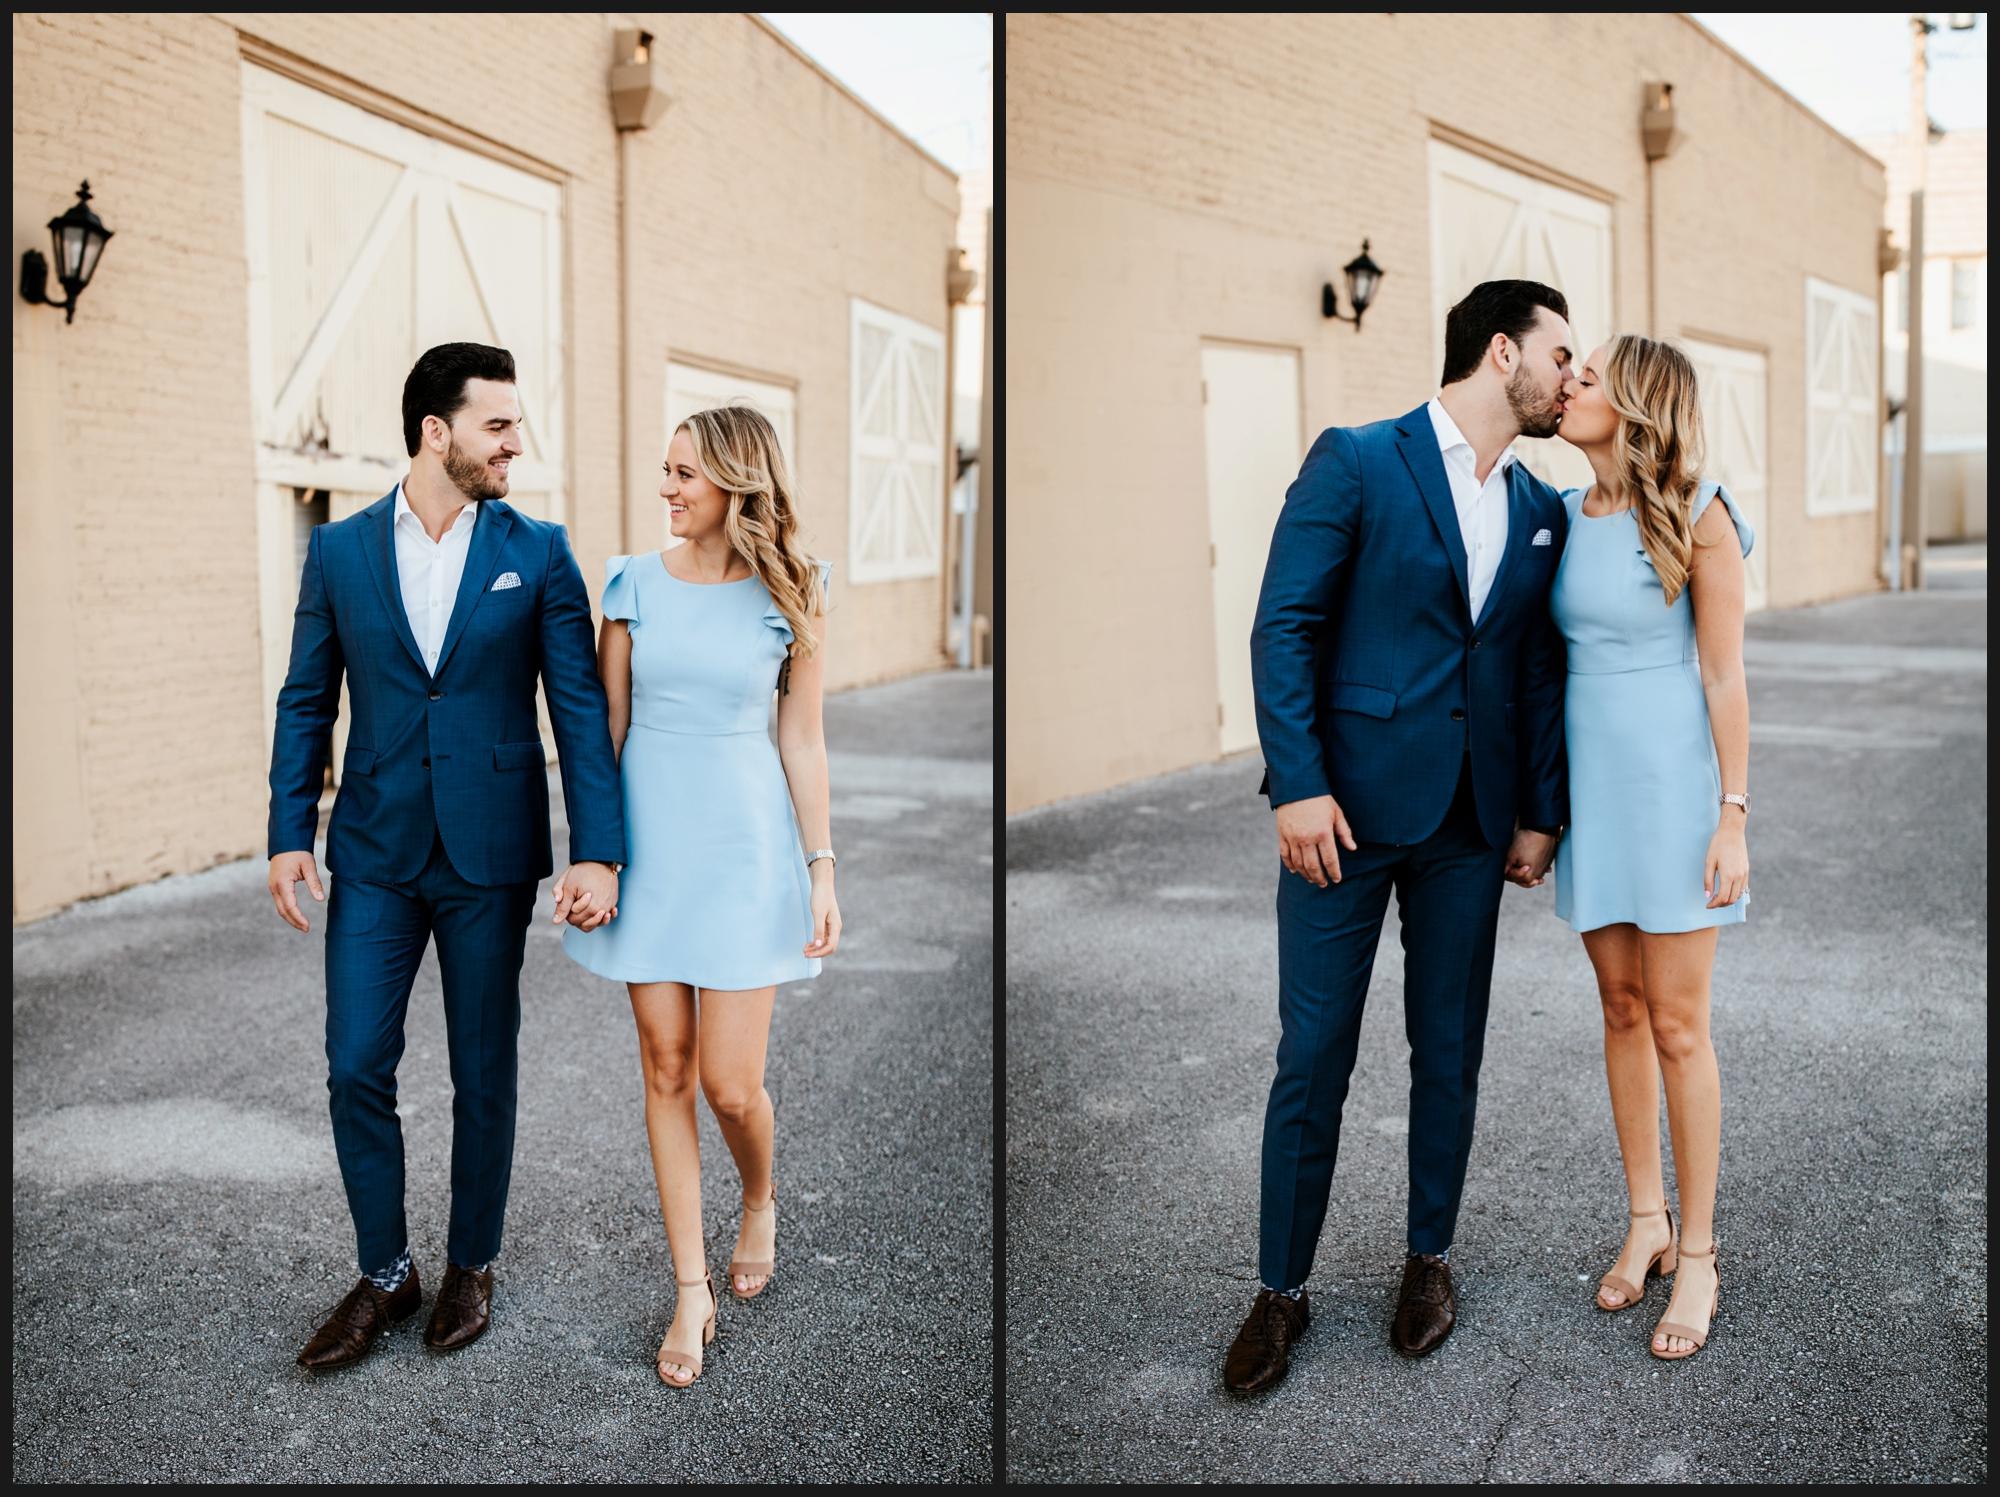 Orlando-Wedding-Photographer-destination-wedding-photographer-florida-wedding-photographer-bohemian-wedding-photographer_1657.jpg